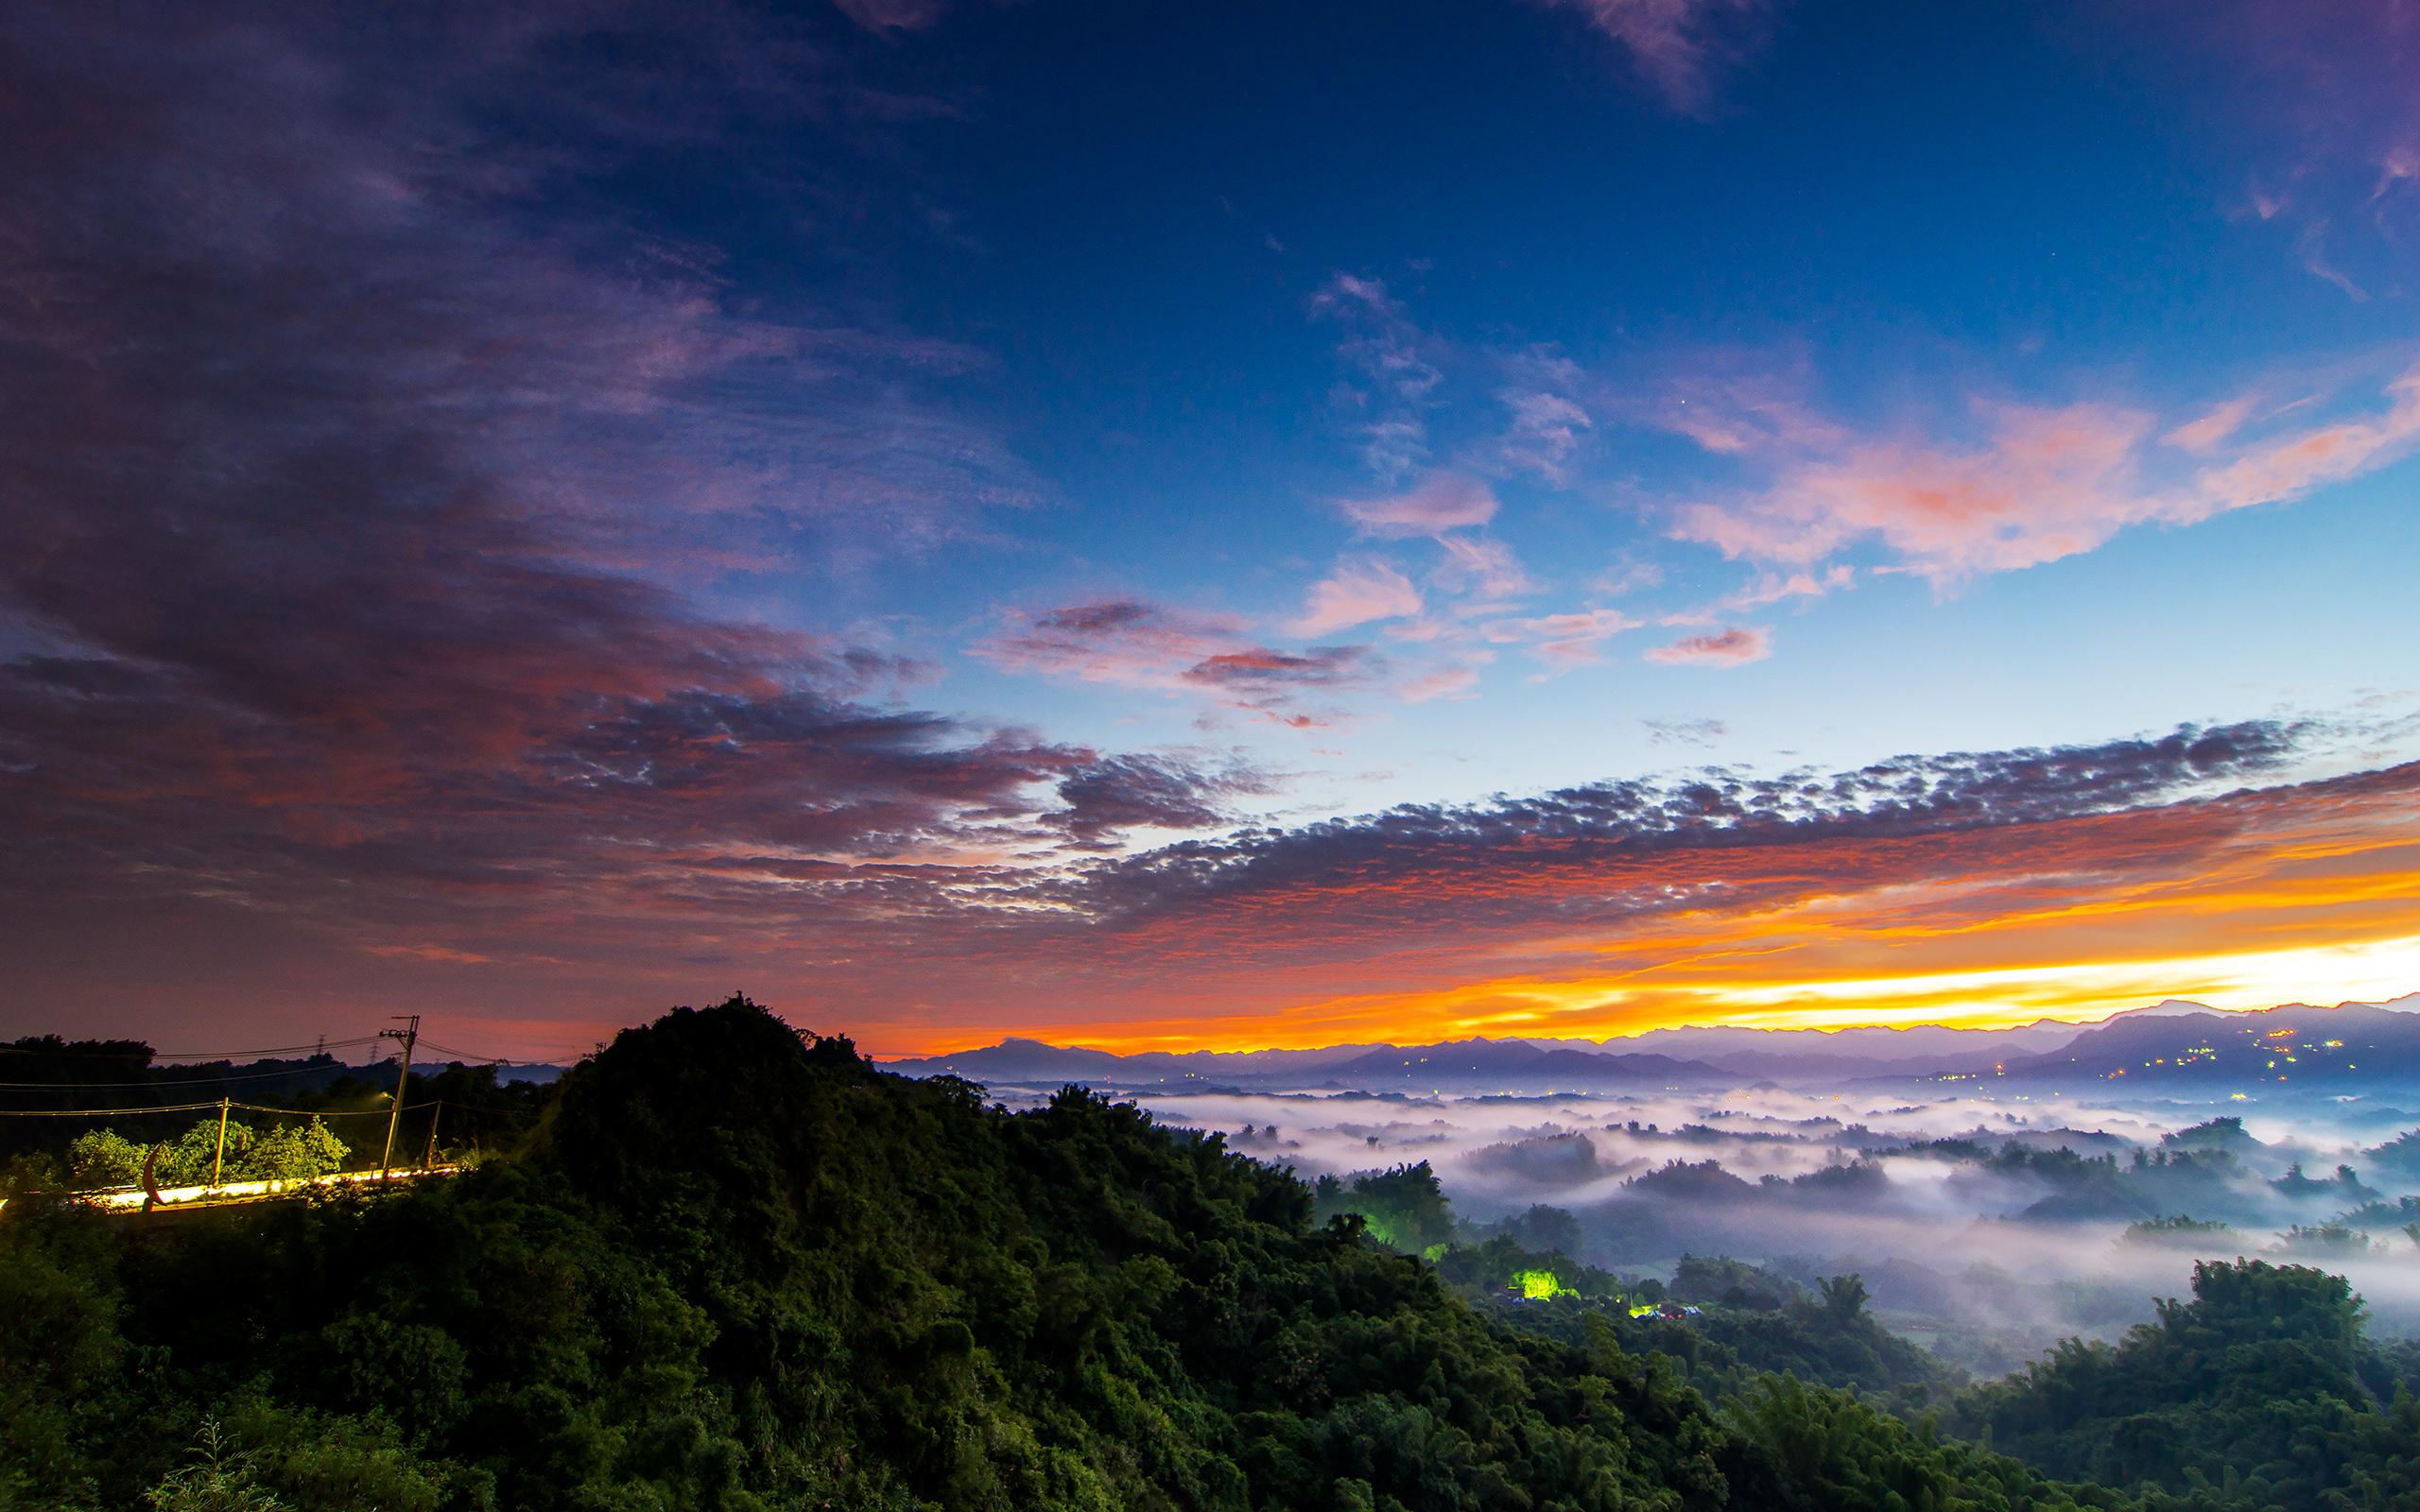 природа страны архитектура закат небо облака без смс